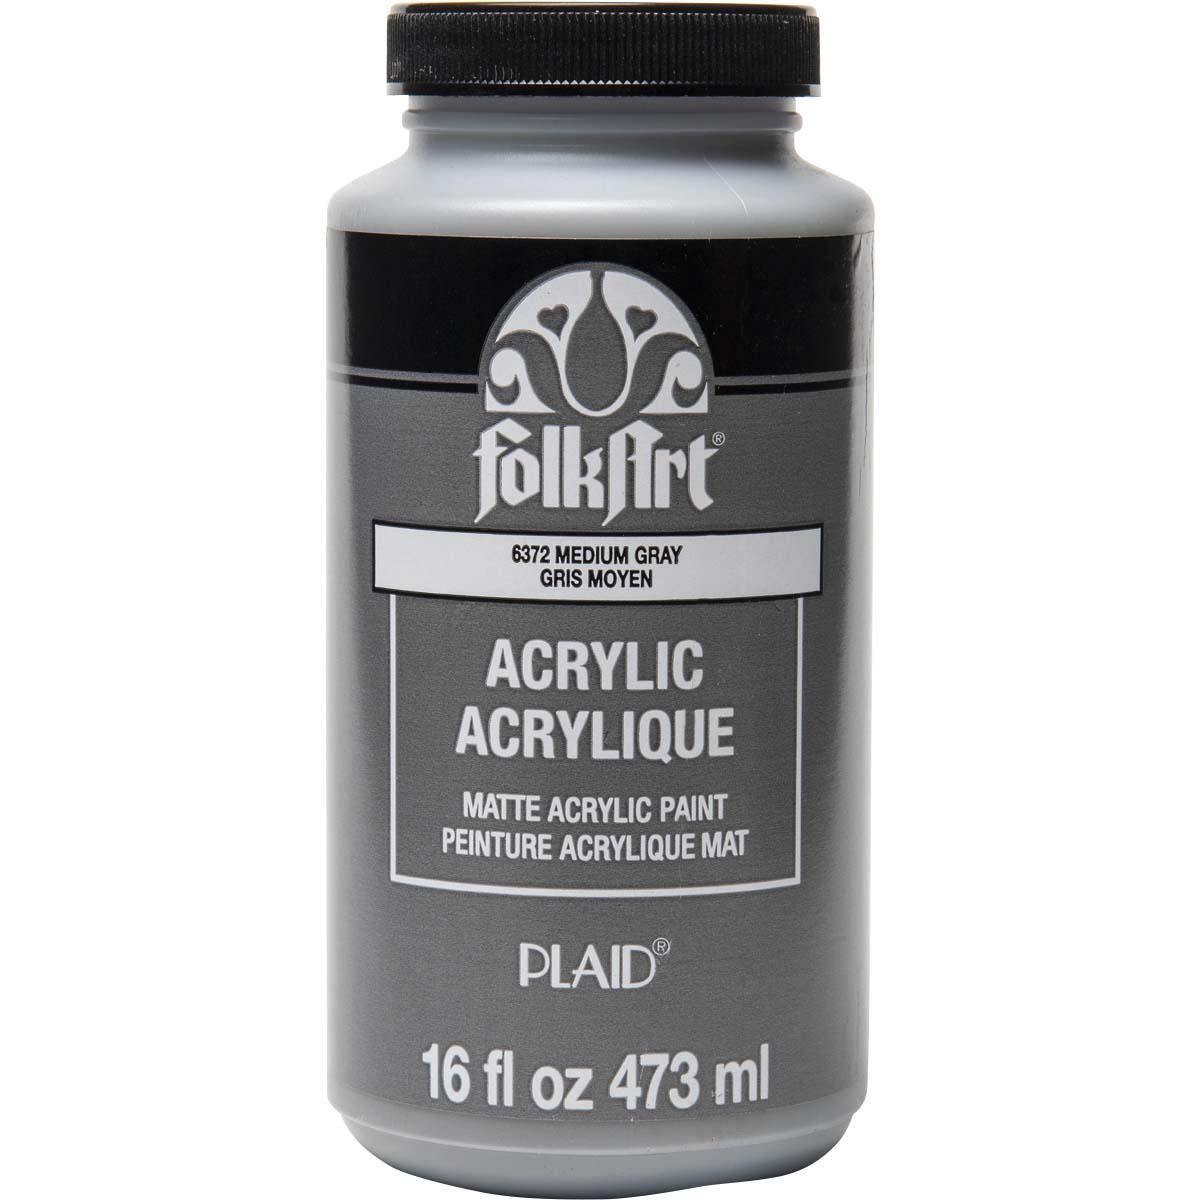 FolkArt ® Acrylic Colors - Medium Gray, 16 oz.